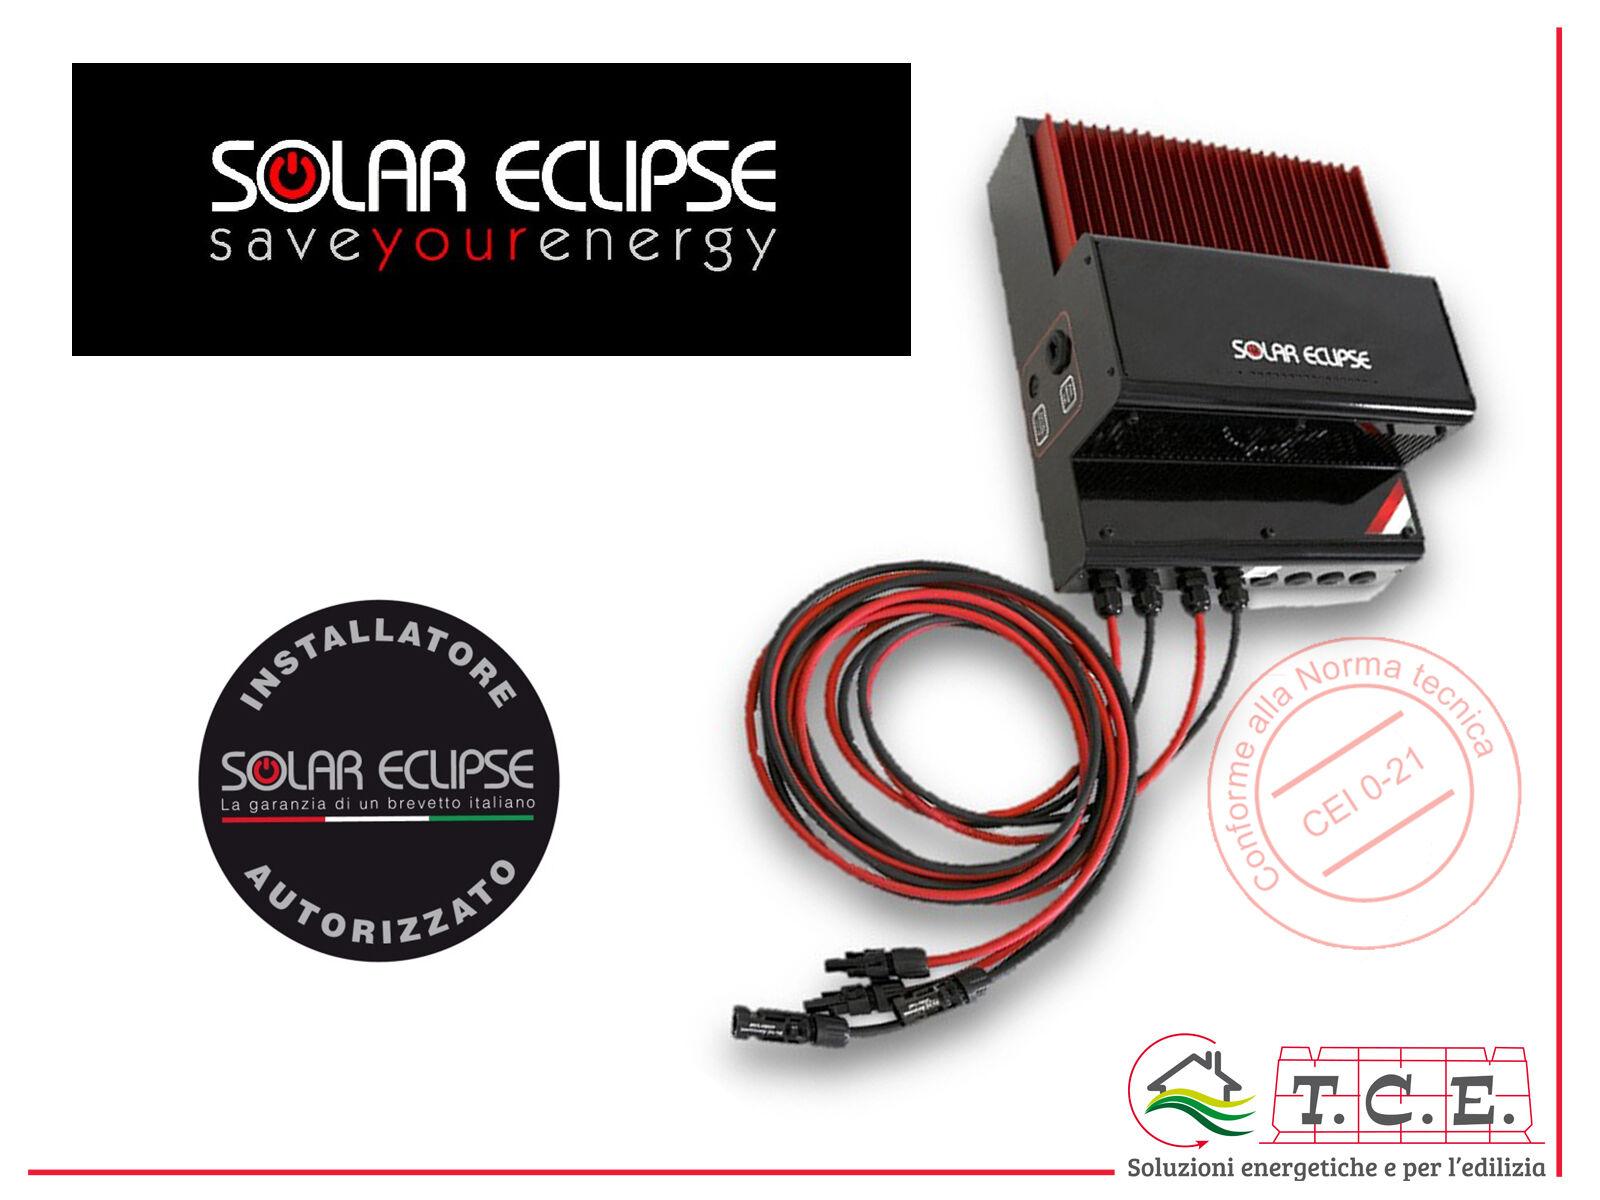 System Inverter accumulation Solar Eclipse Light Photovoltaic Storage retrofit